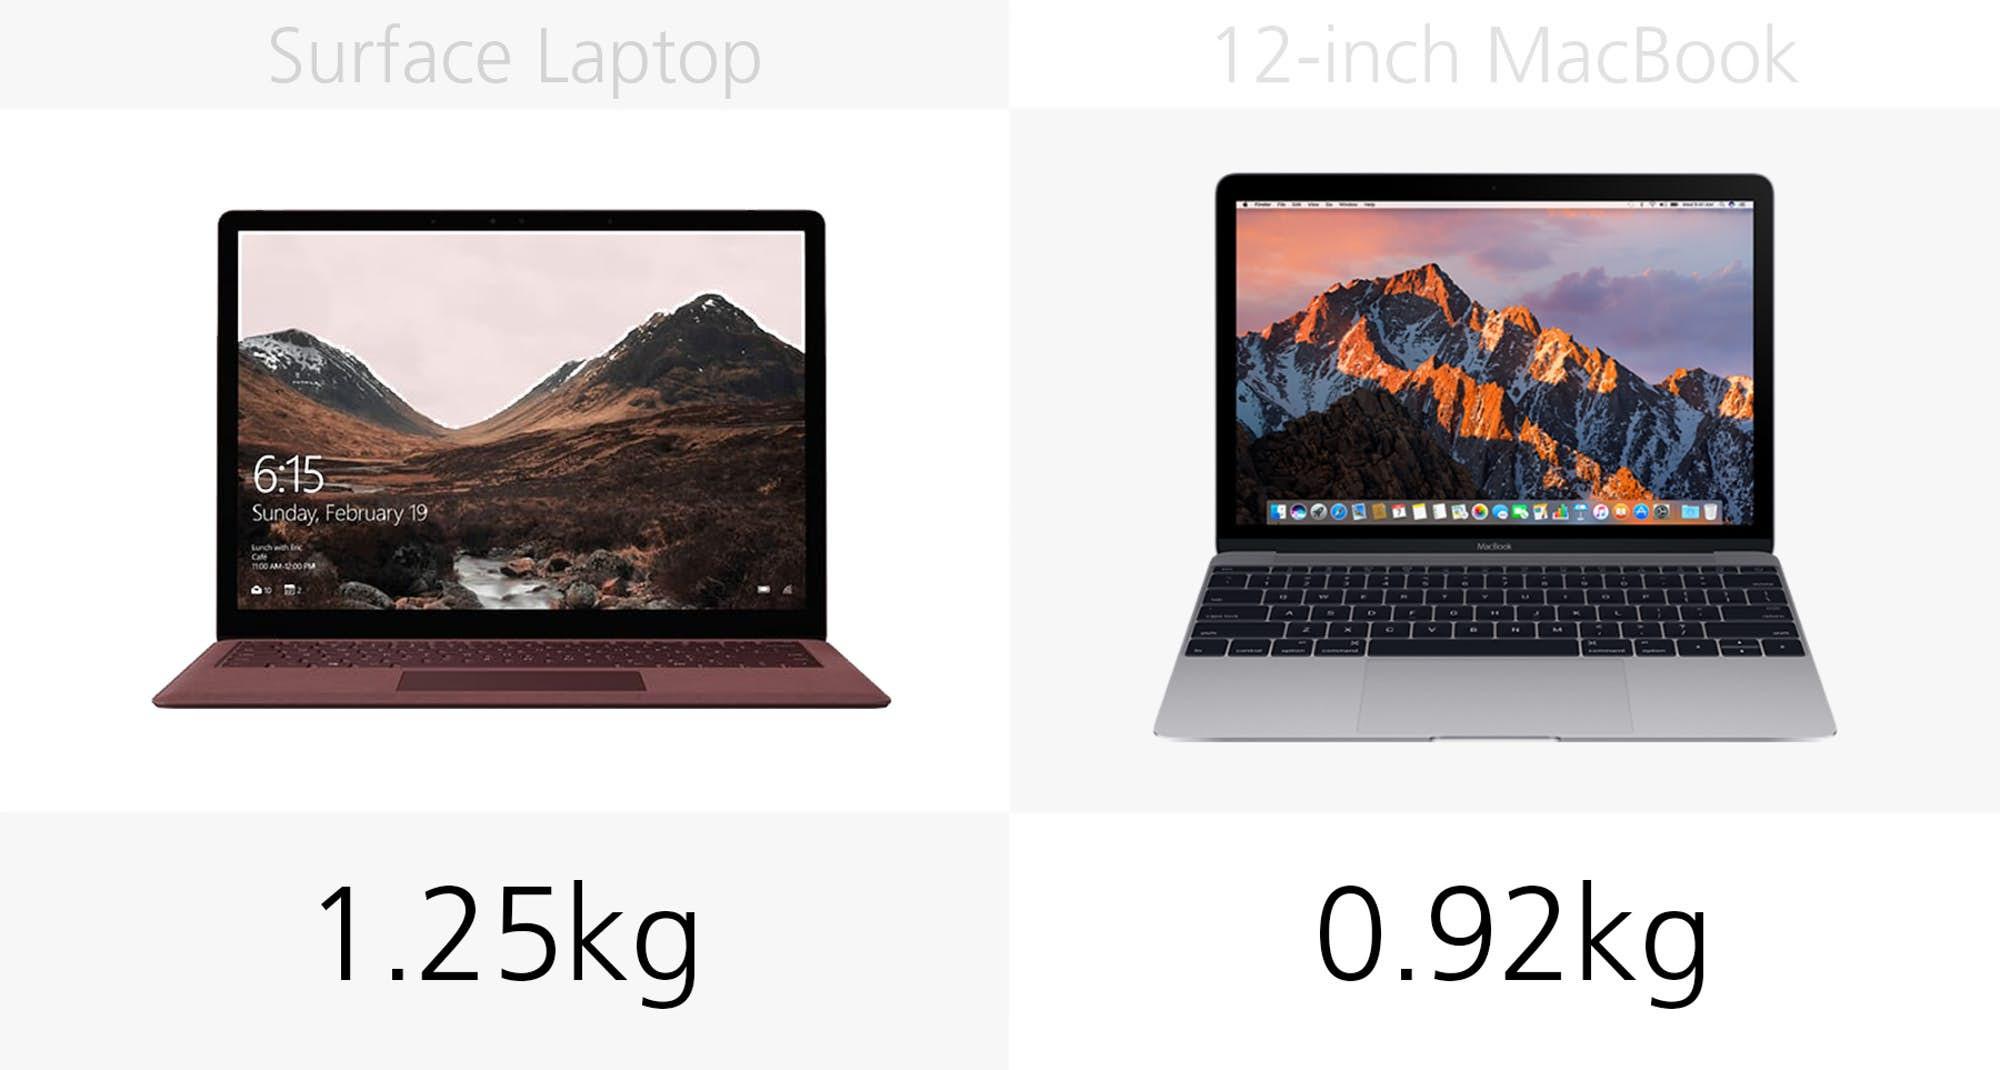 1493888119_apple-macbook-vs-microsoft-surface-laptop-26.jpg